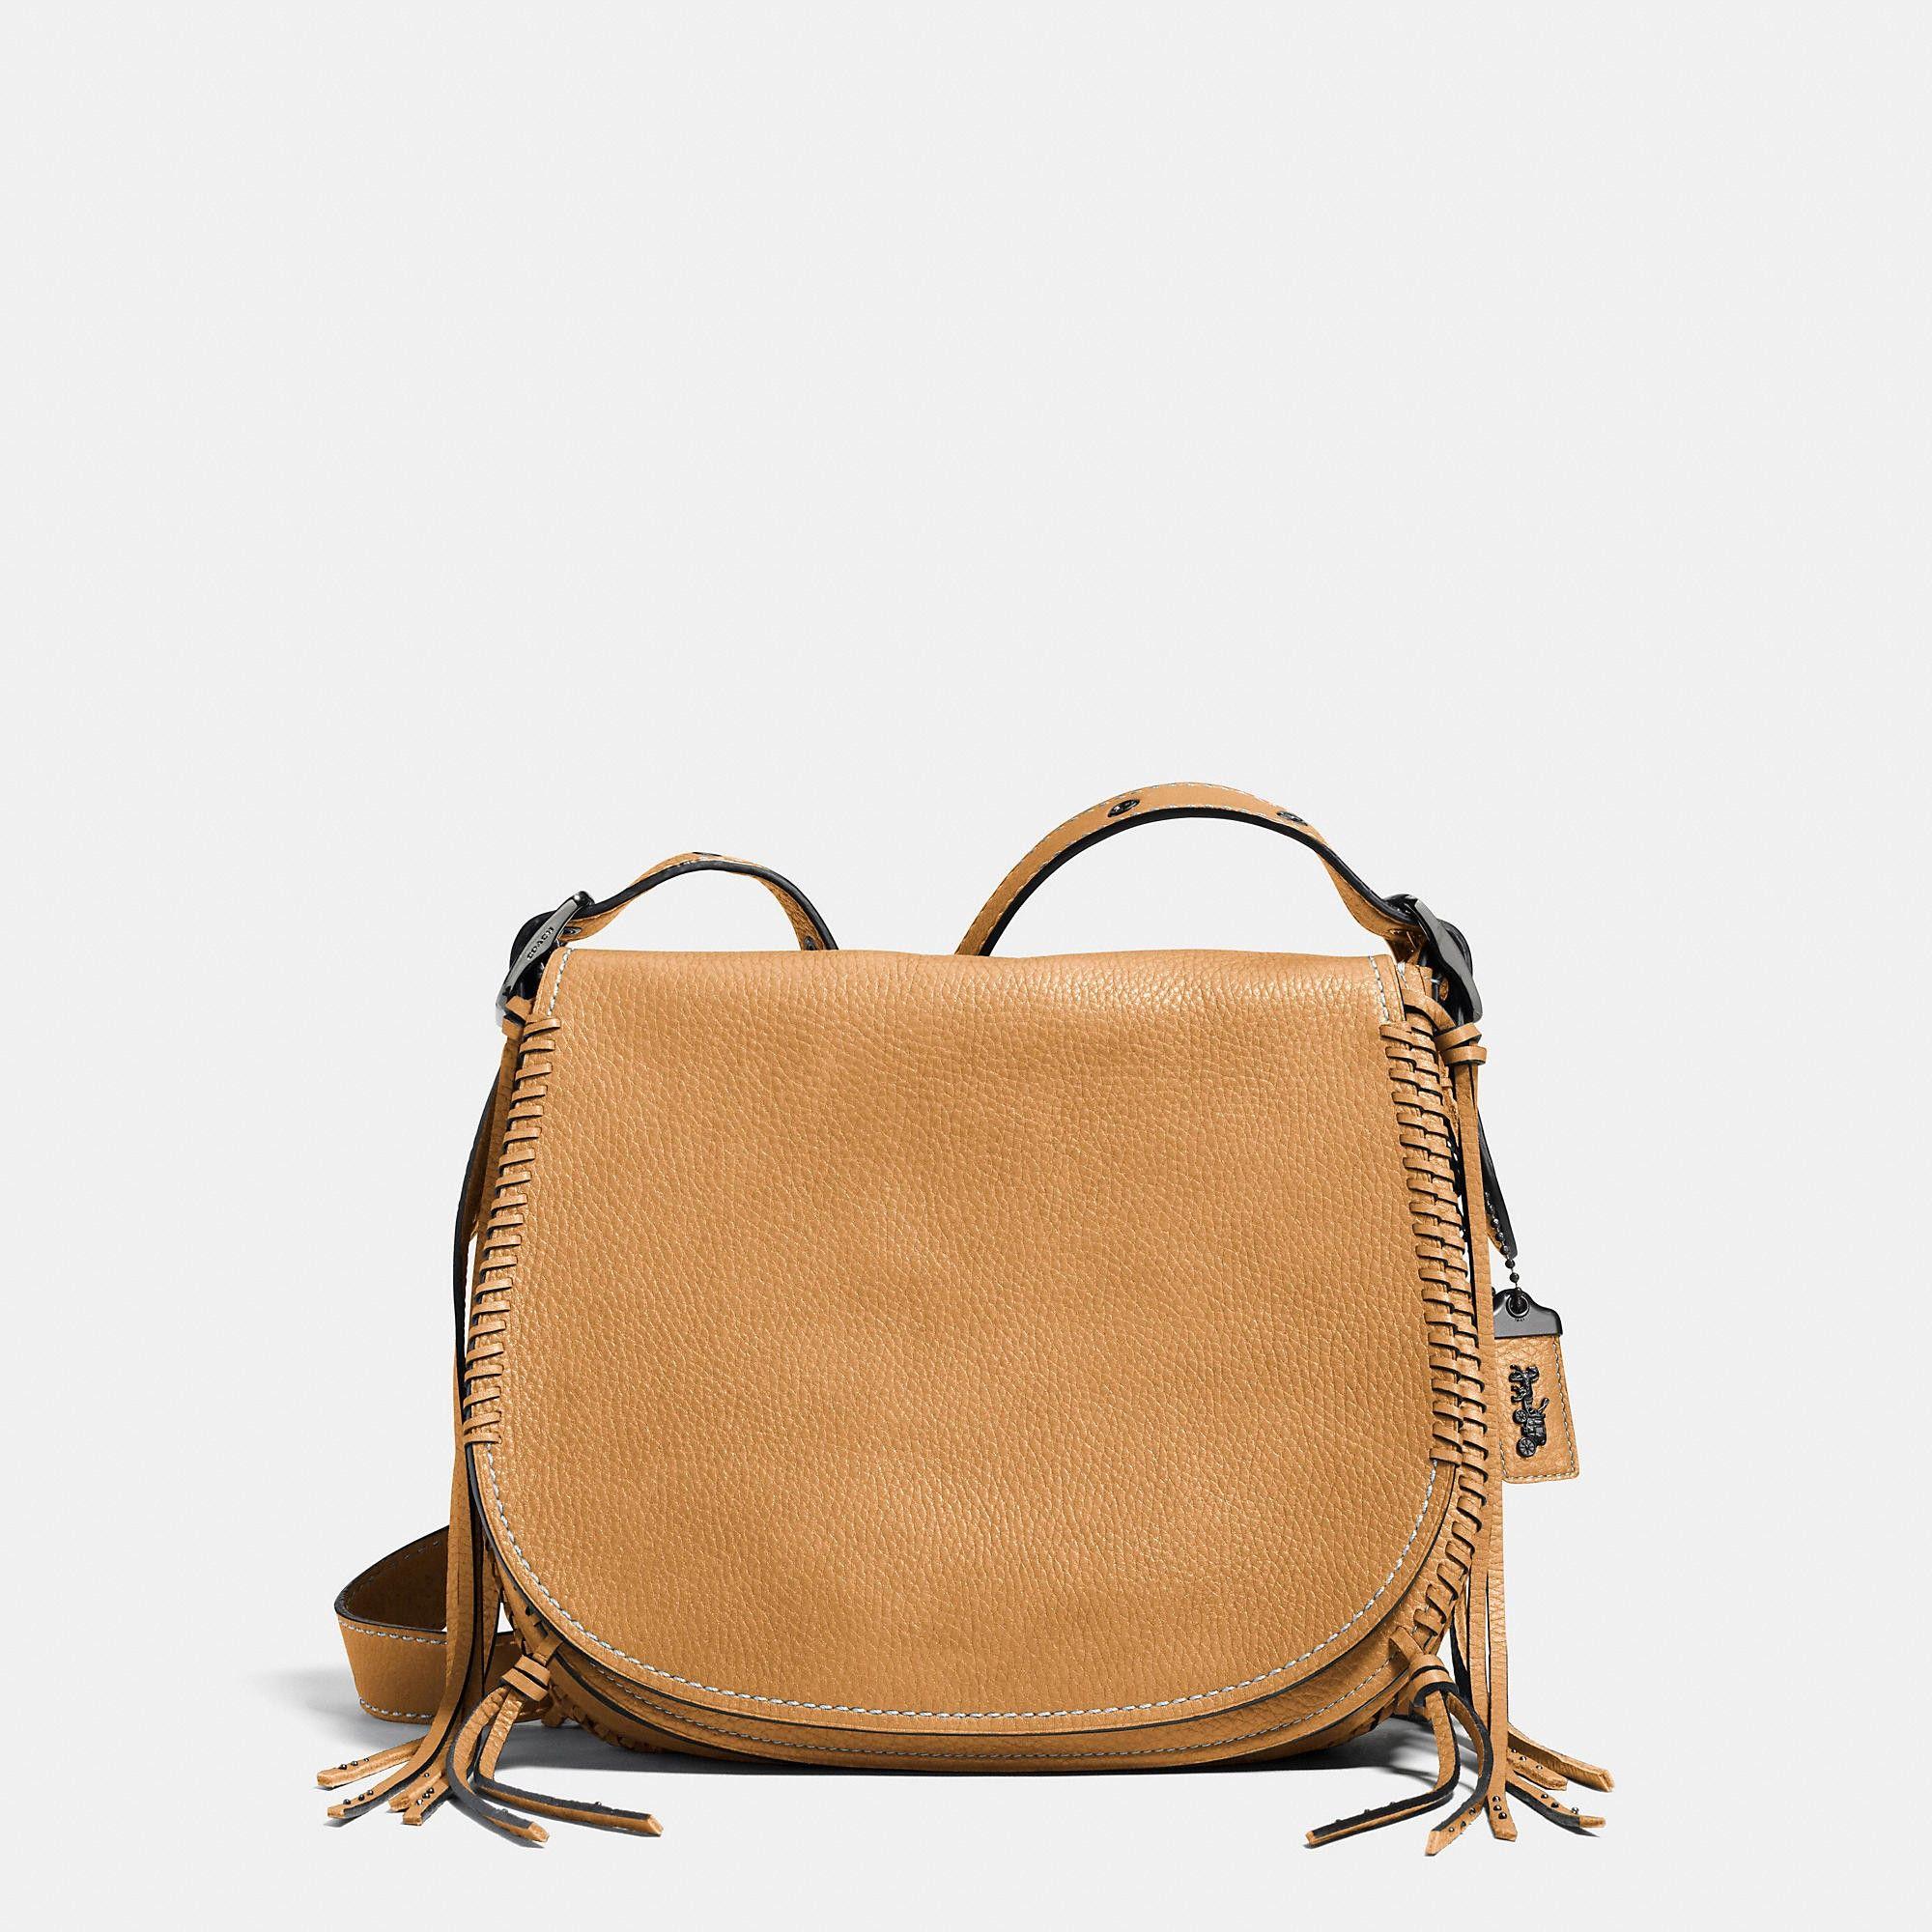 9047540eb528 COACH Whiplash Saddle Bag In Leather.  coach  bags  leather ...